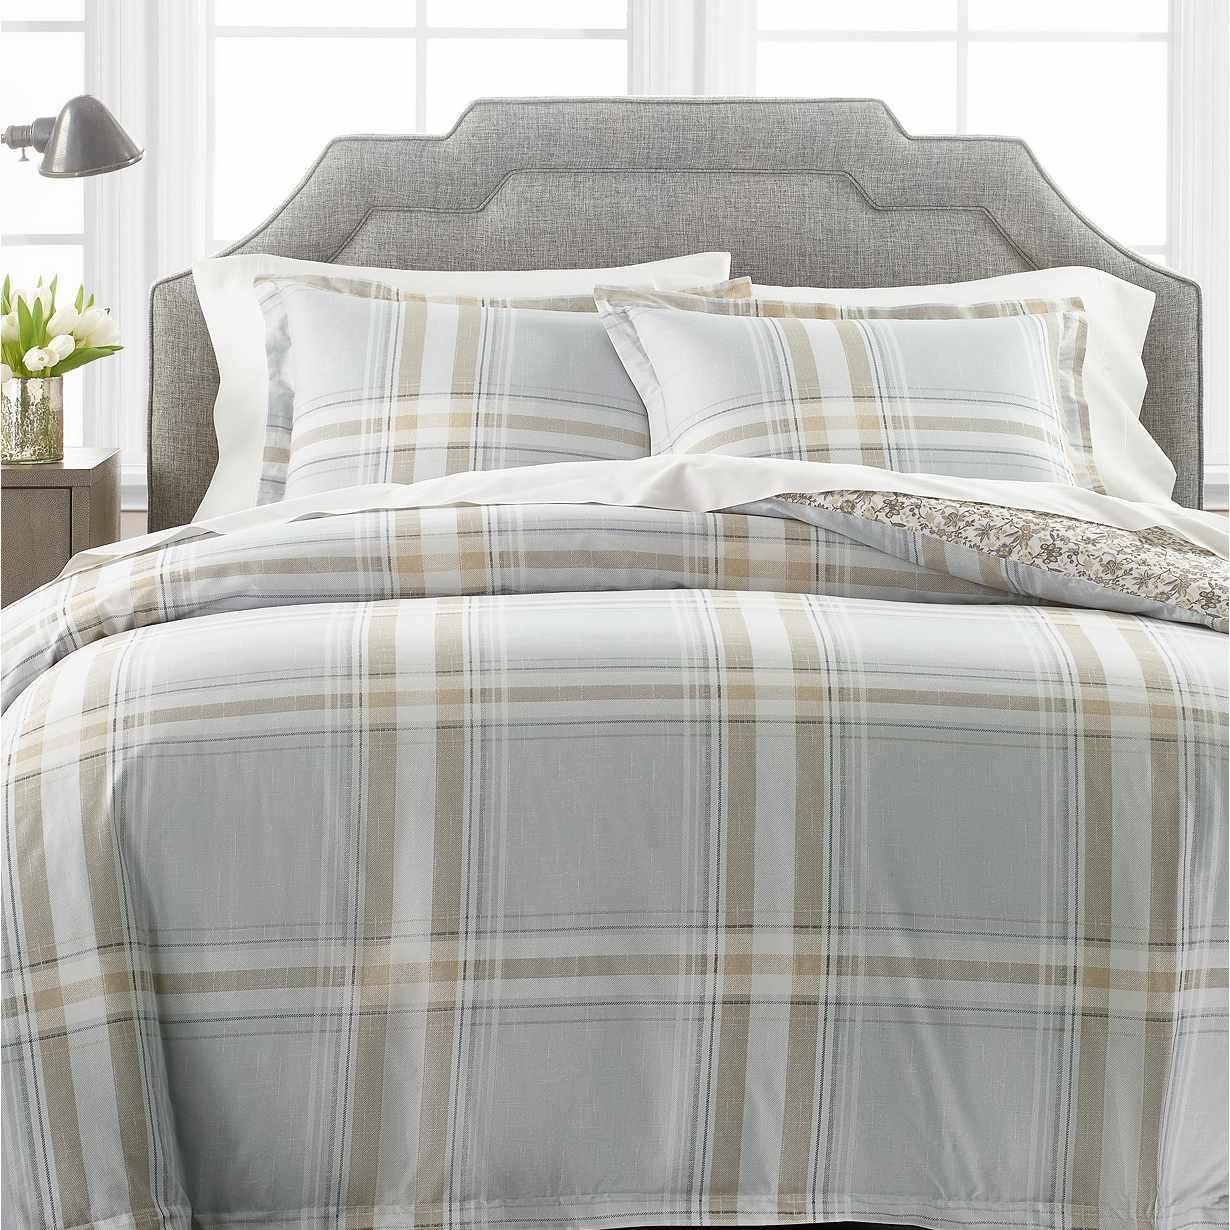 Martha Stewart Percale Gray Plaid Bedding